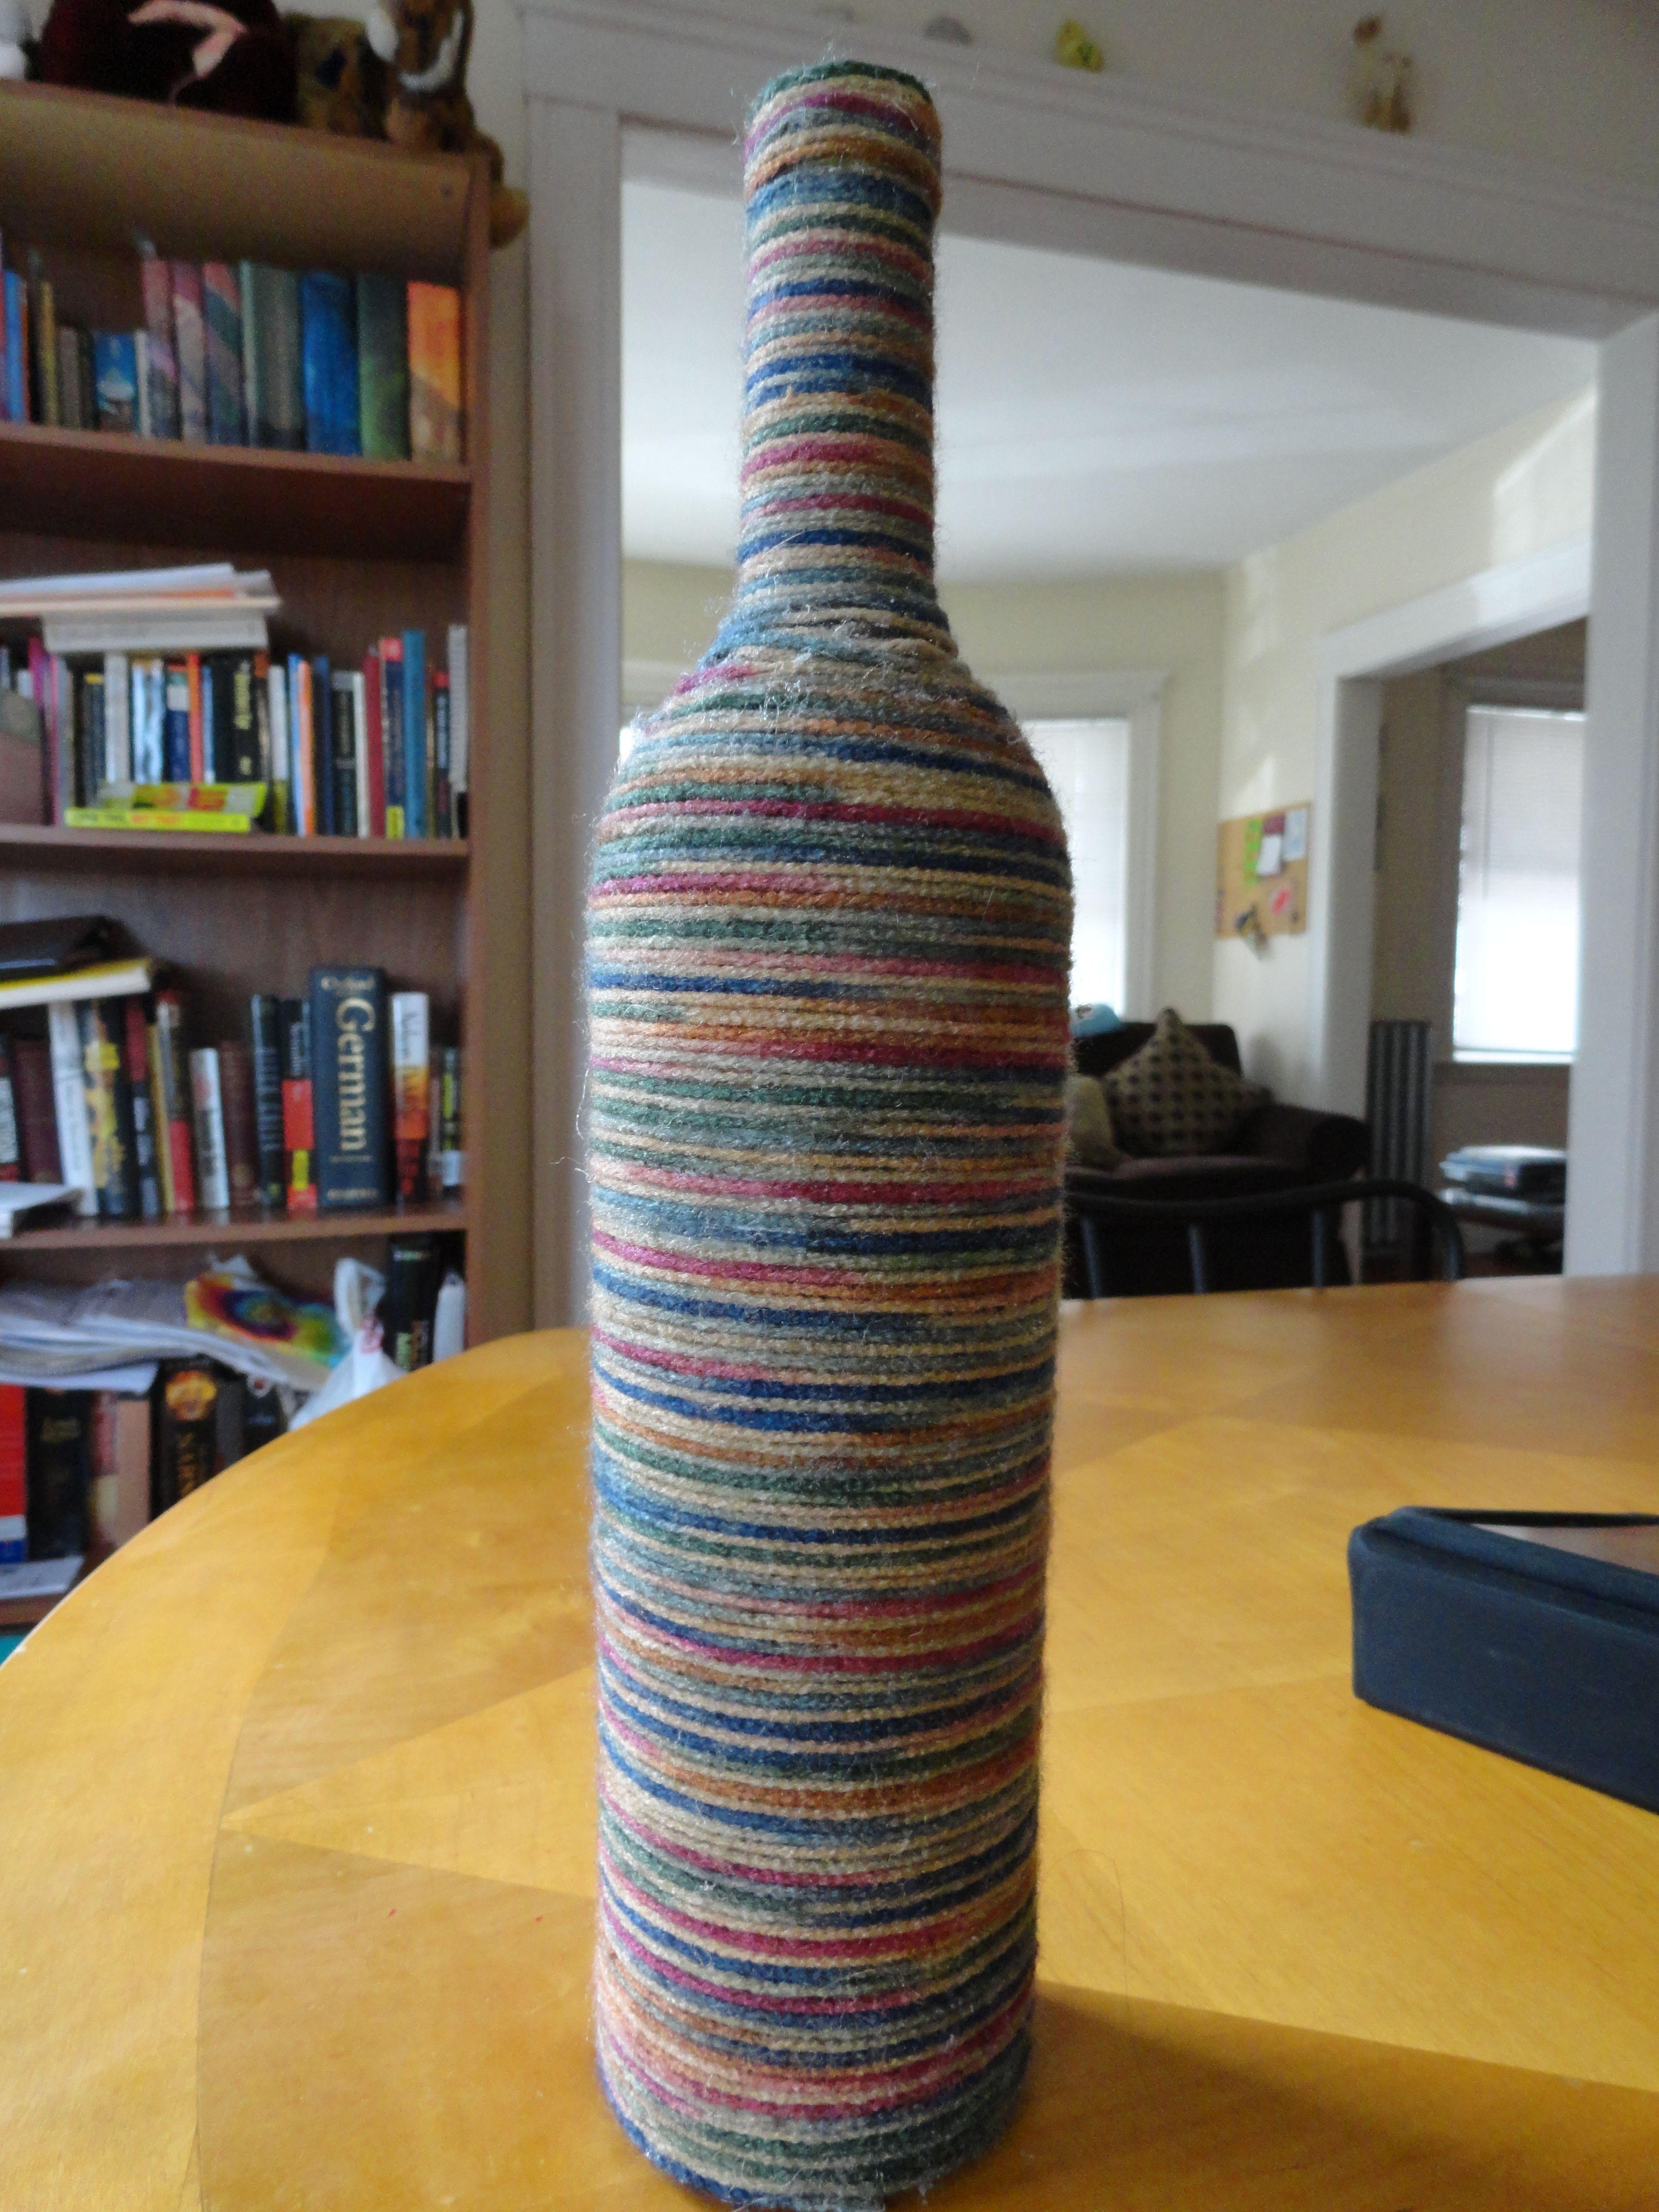 Diy Wine Bottle With Yarn Craft Home Decor Ideas Pinterest